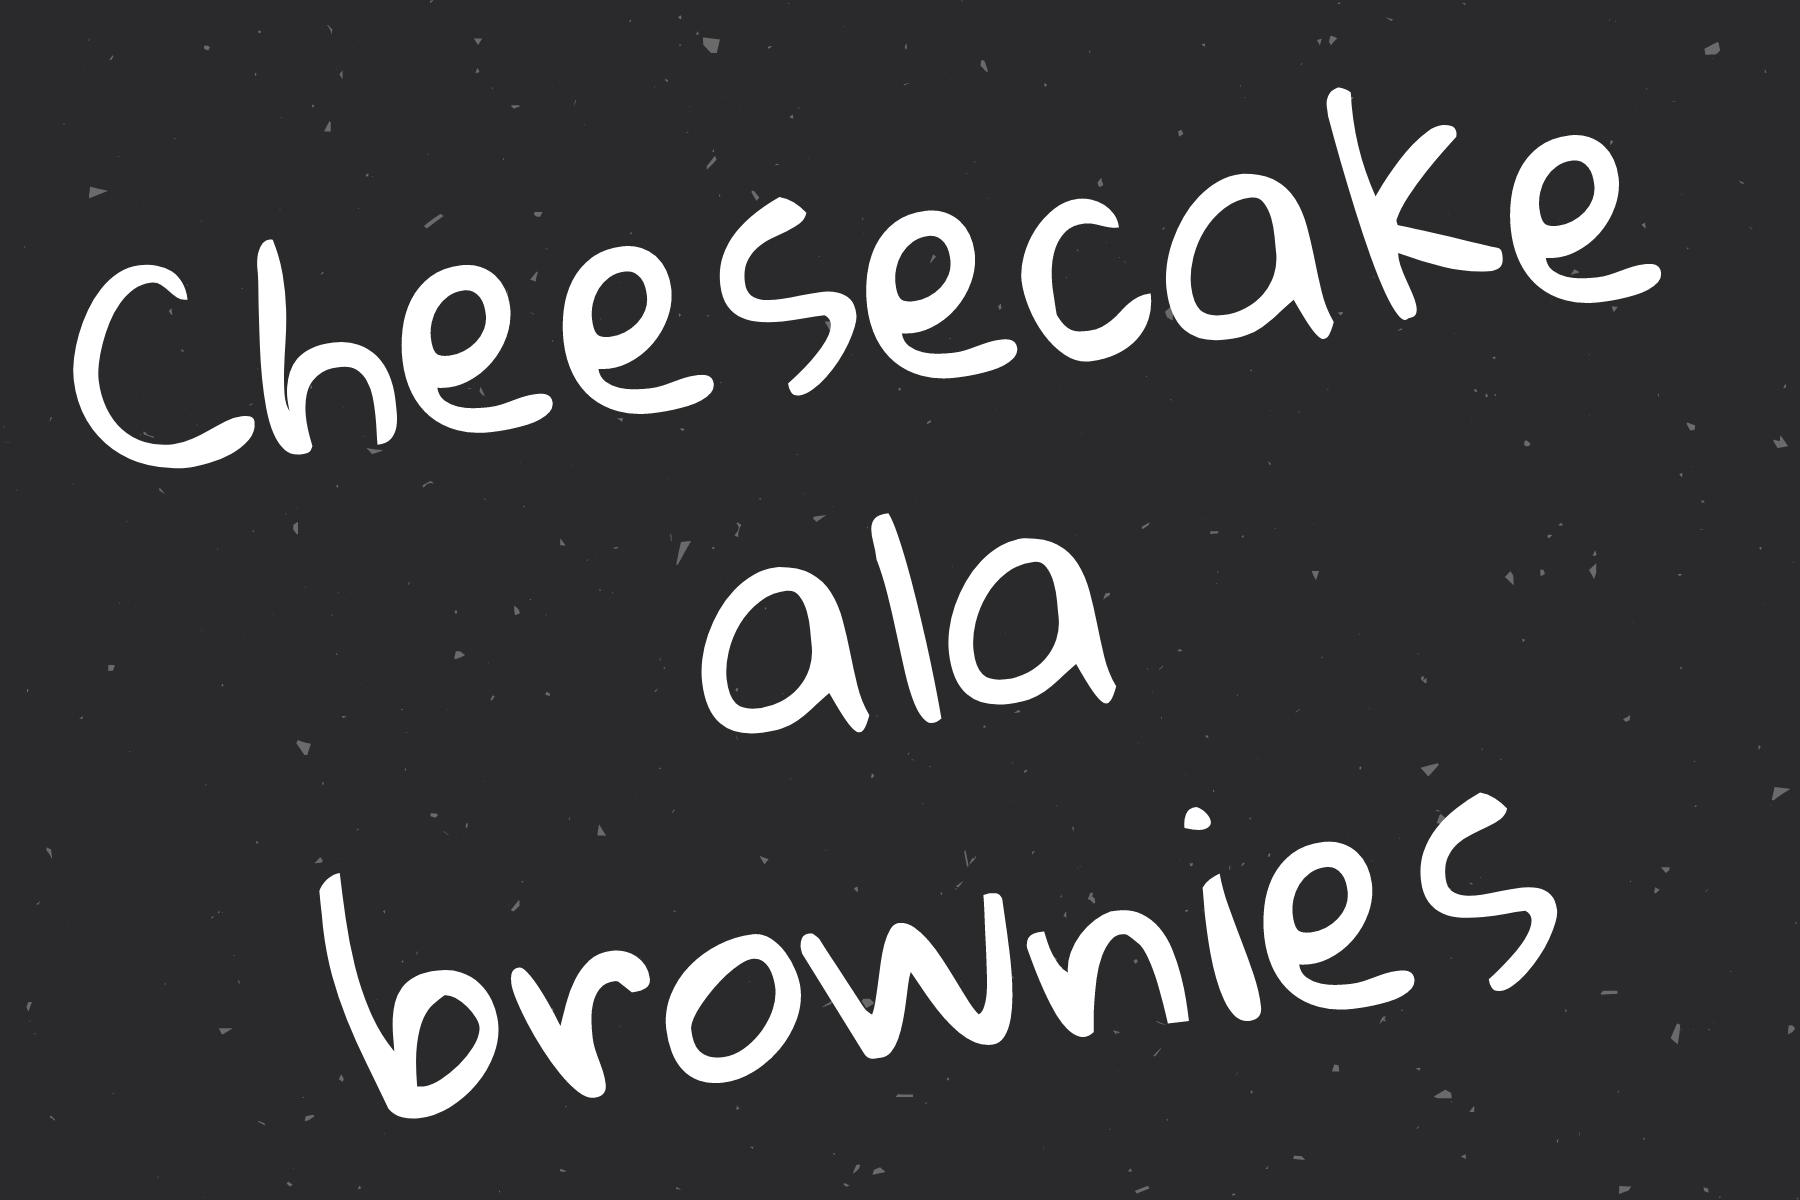 CHEESECAKE ALA BROWNIES